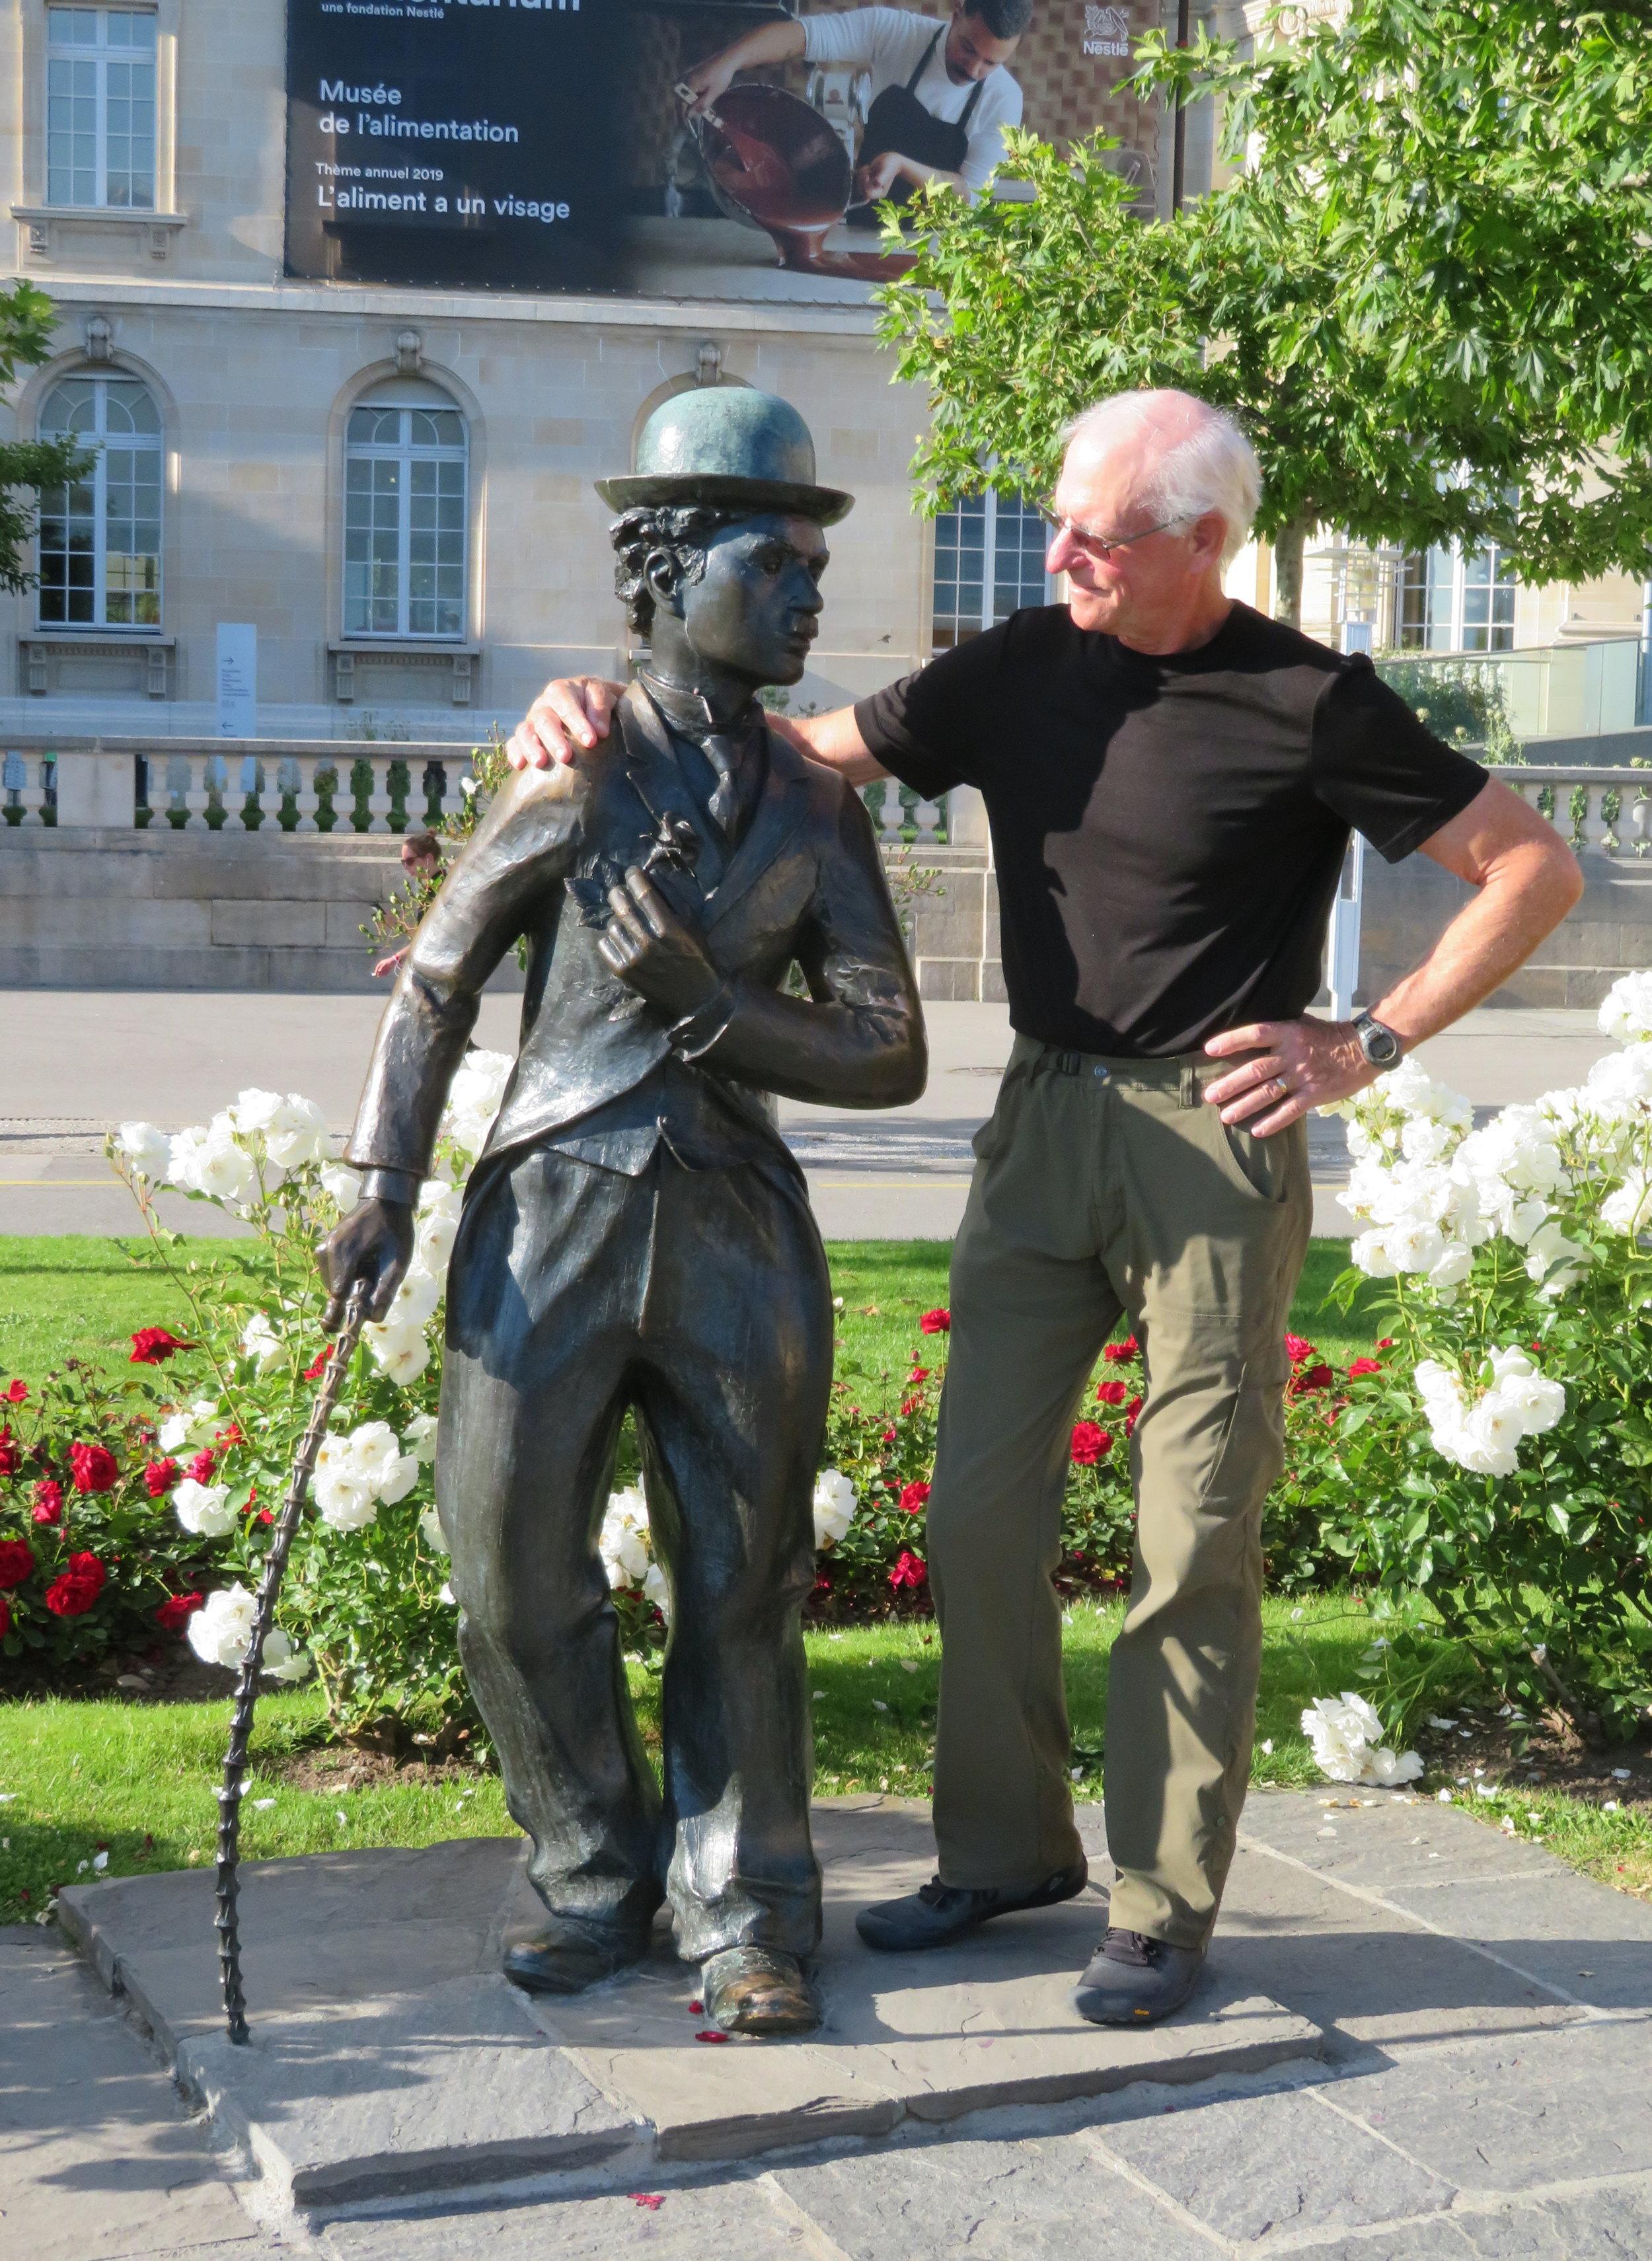 Aigle-Vevey_charlie chaplin statue-del.JPG